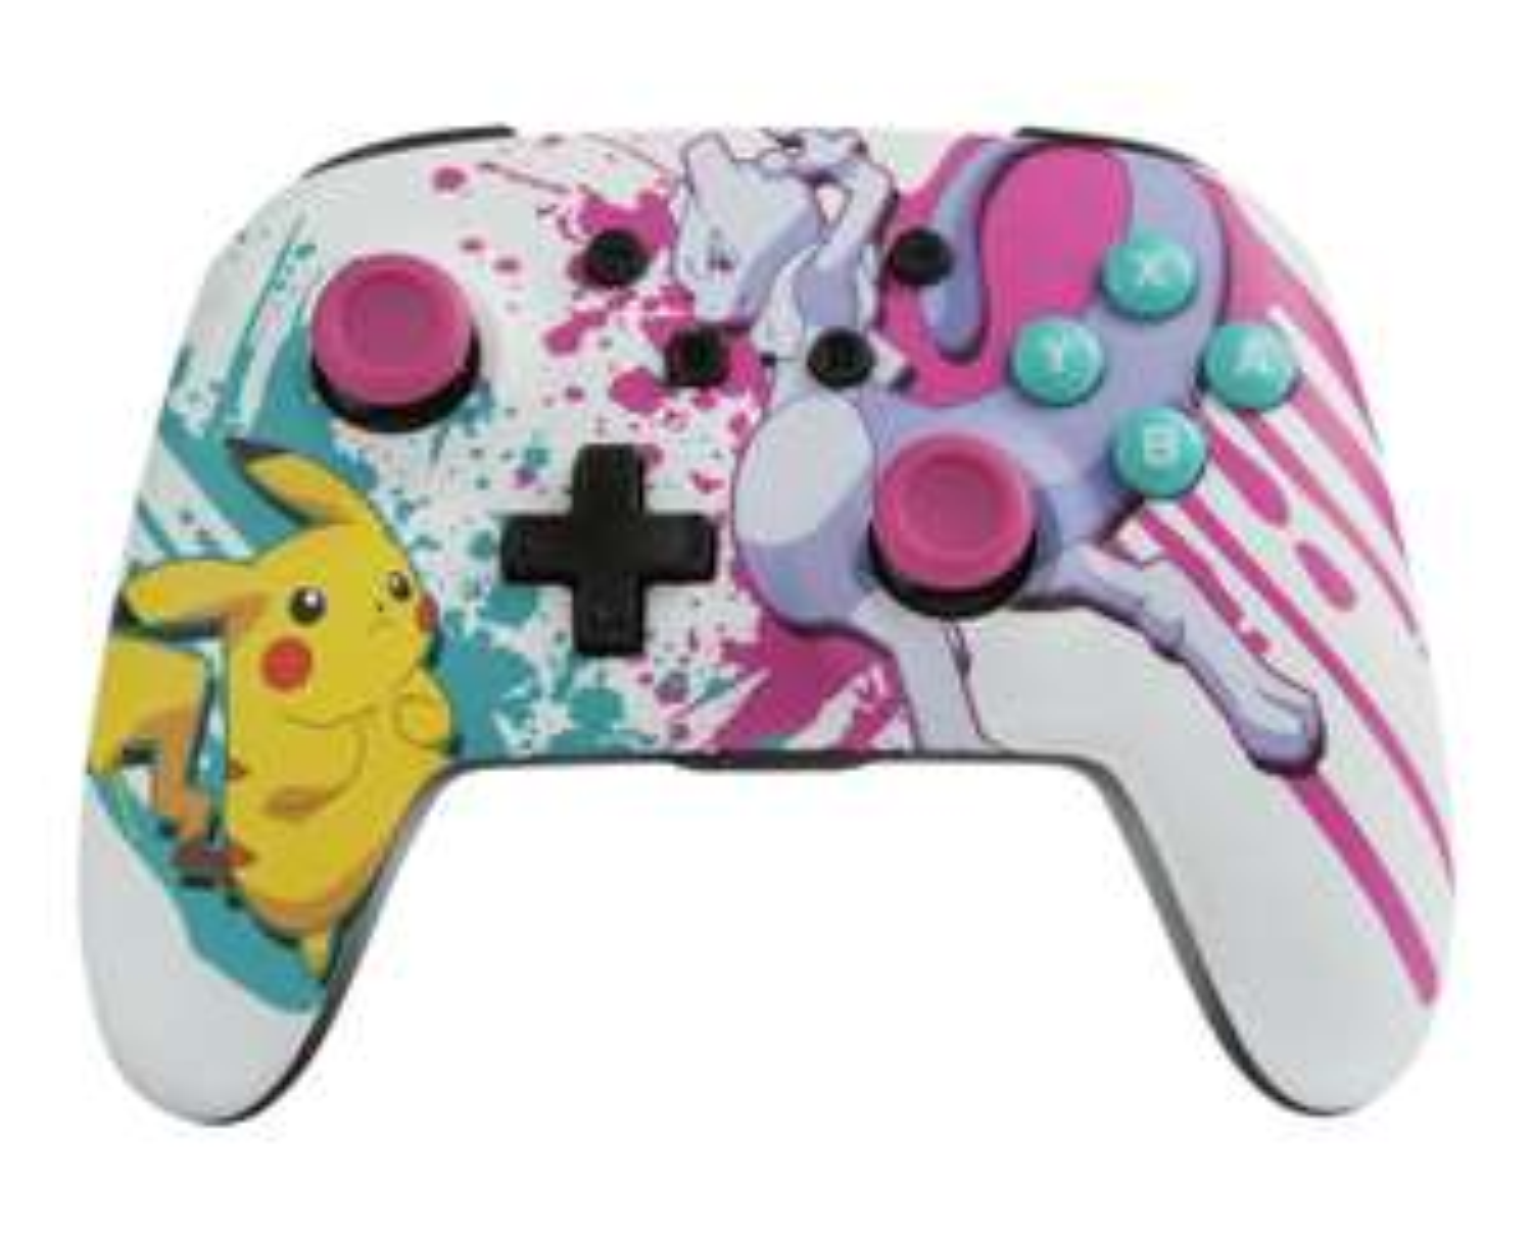 Wireless Controller for Nintendo Switch - Pokemon Battle - £29.99 @ Argos